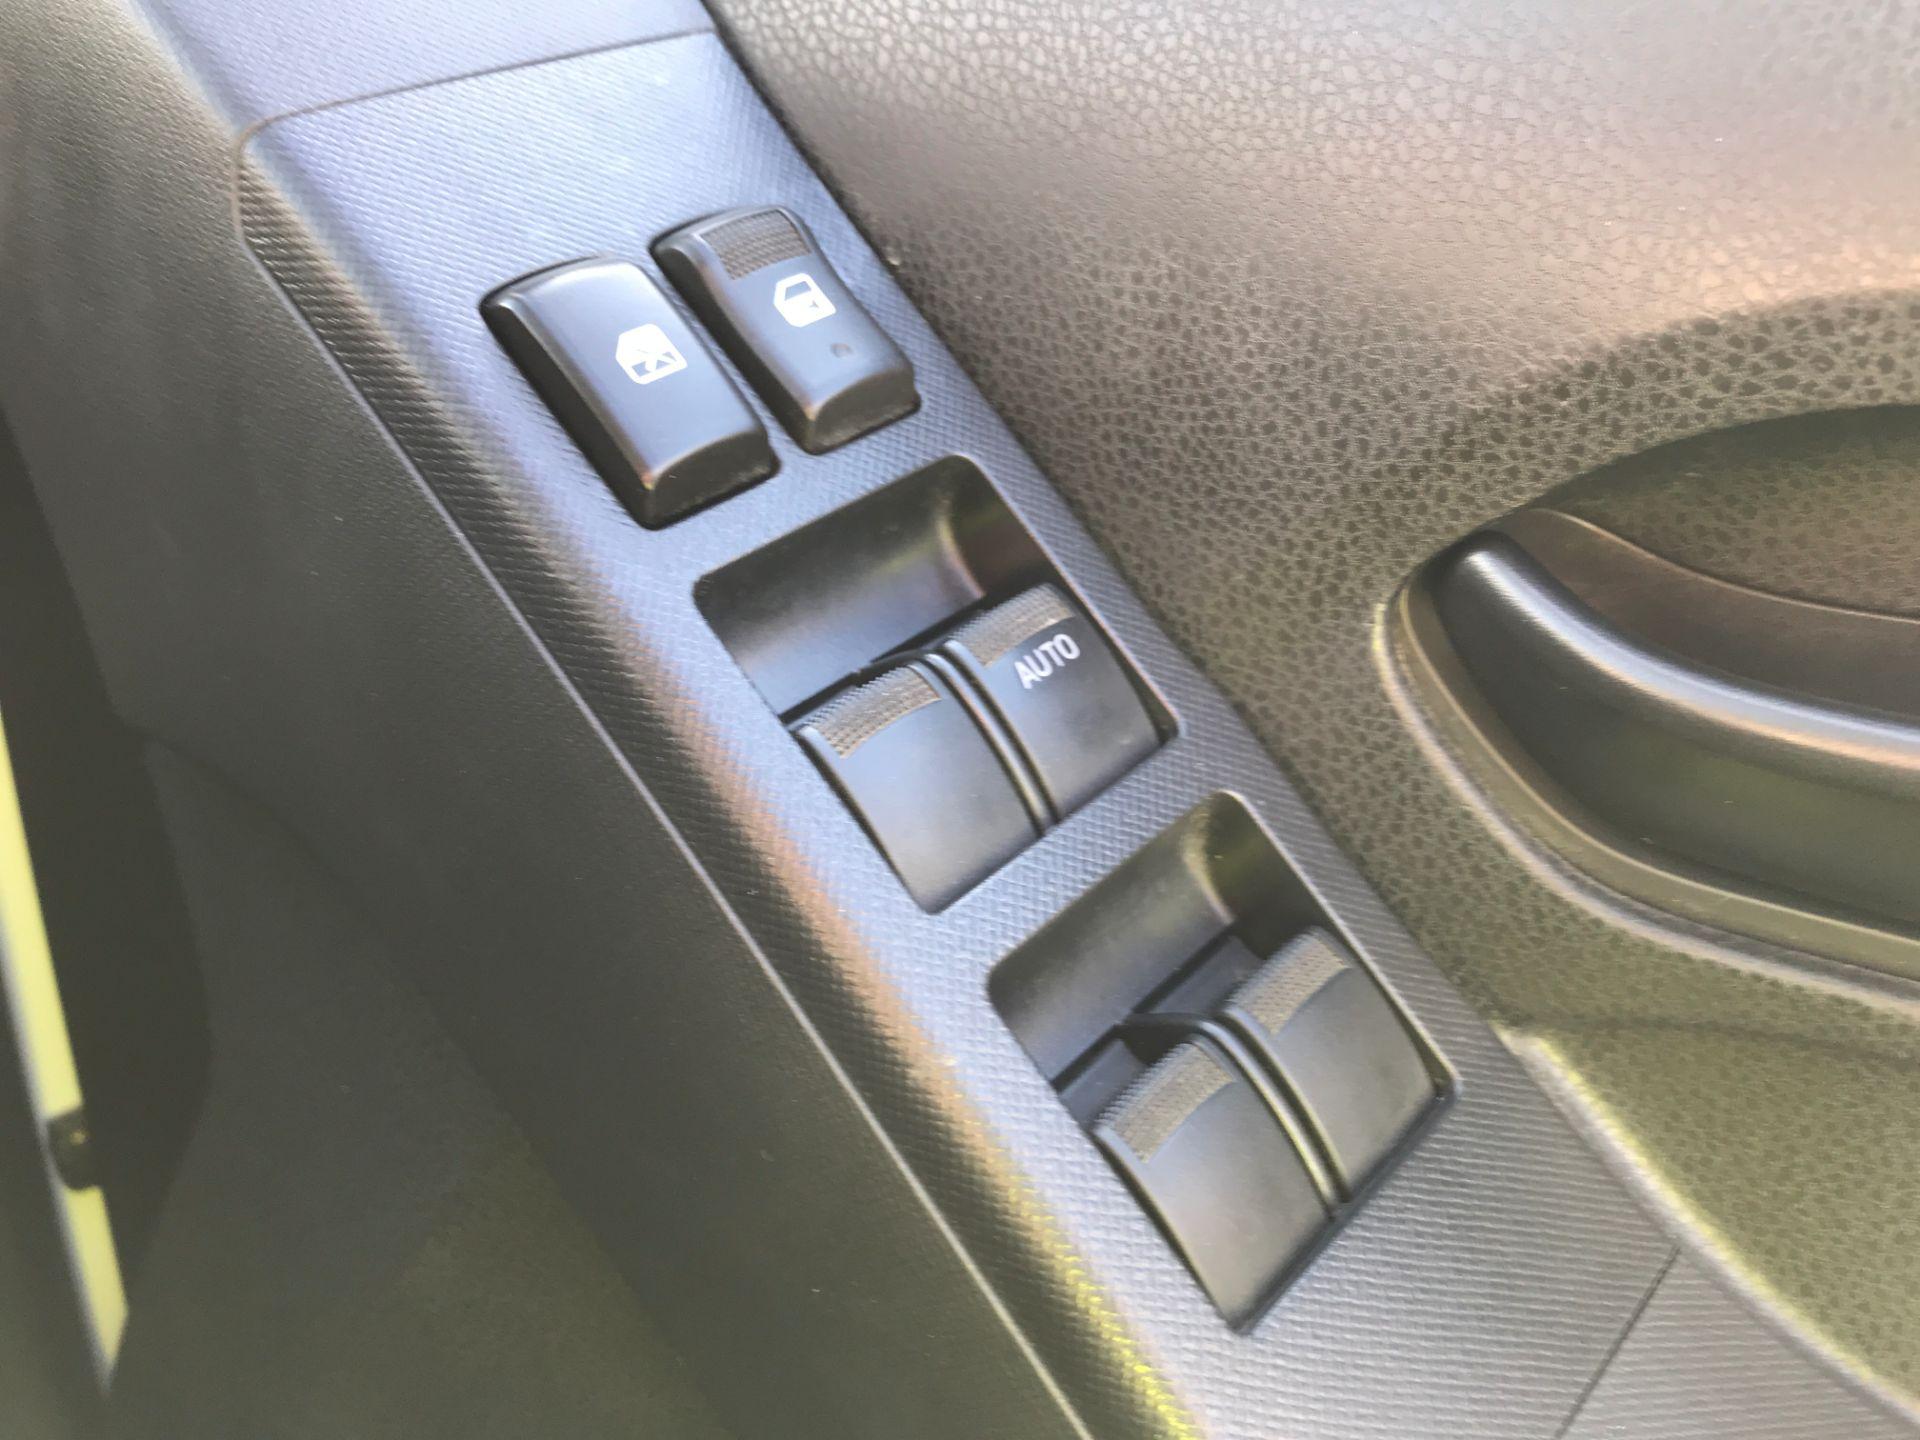 2015 Isuzu D-Max DOUBLE CAB 4X4 2.5TD 163PS EURO 5, AIR CON (YB65DJF) Image 20